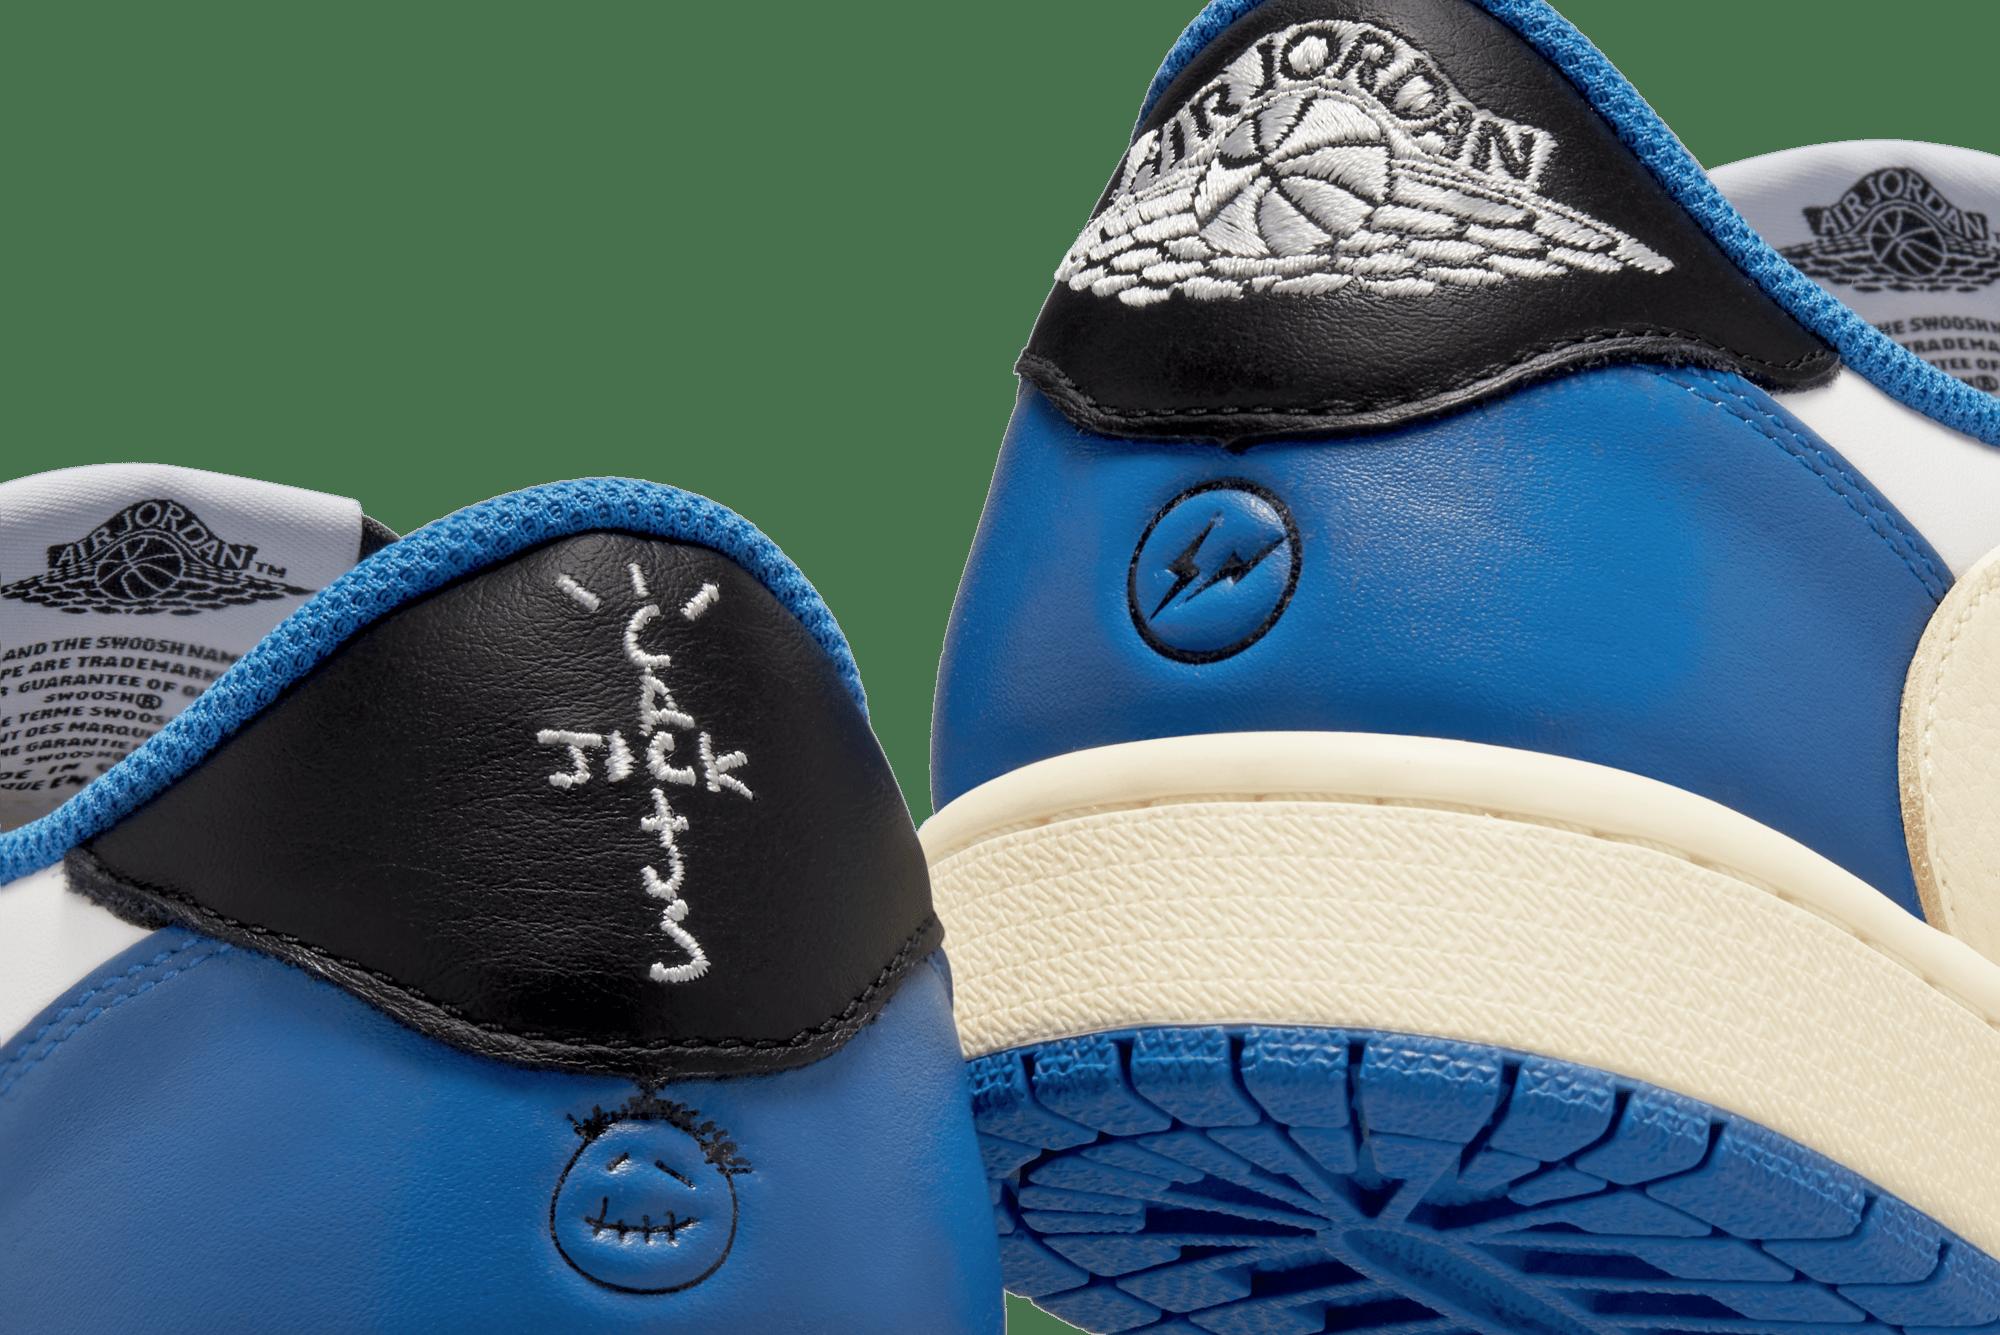 Nike x Fragment Design x Travis Scott Air Jordan 1 Low OG - DM7866-140